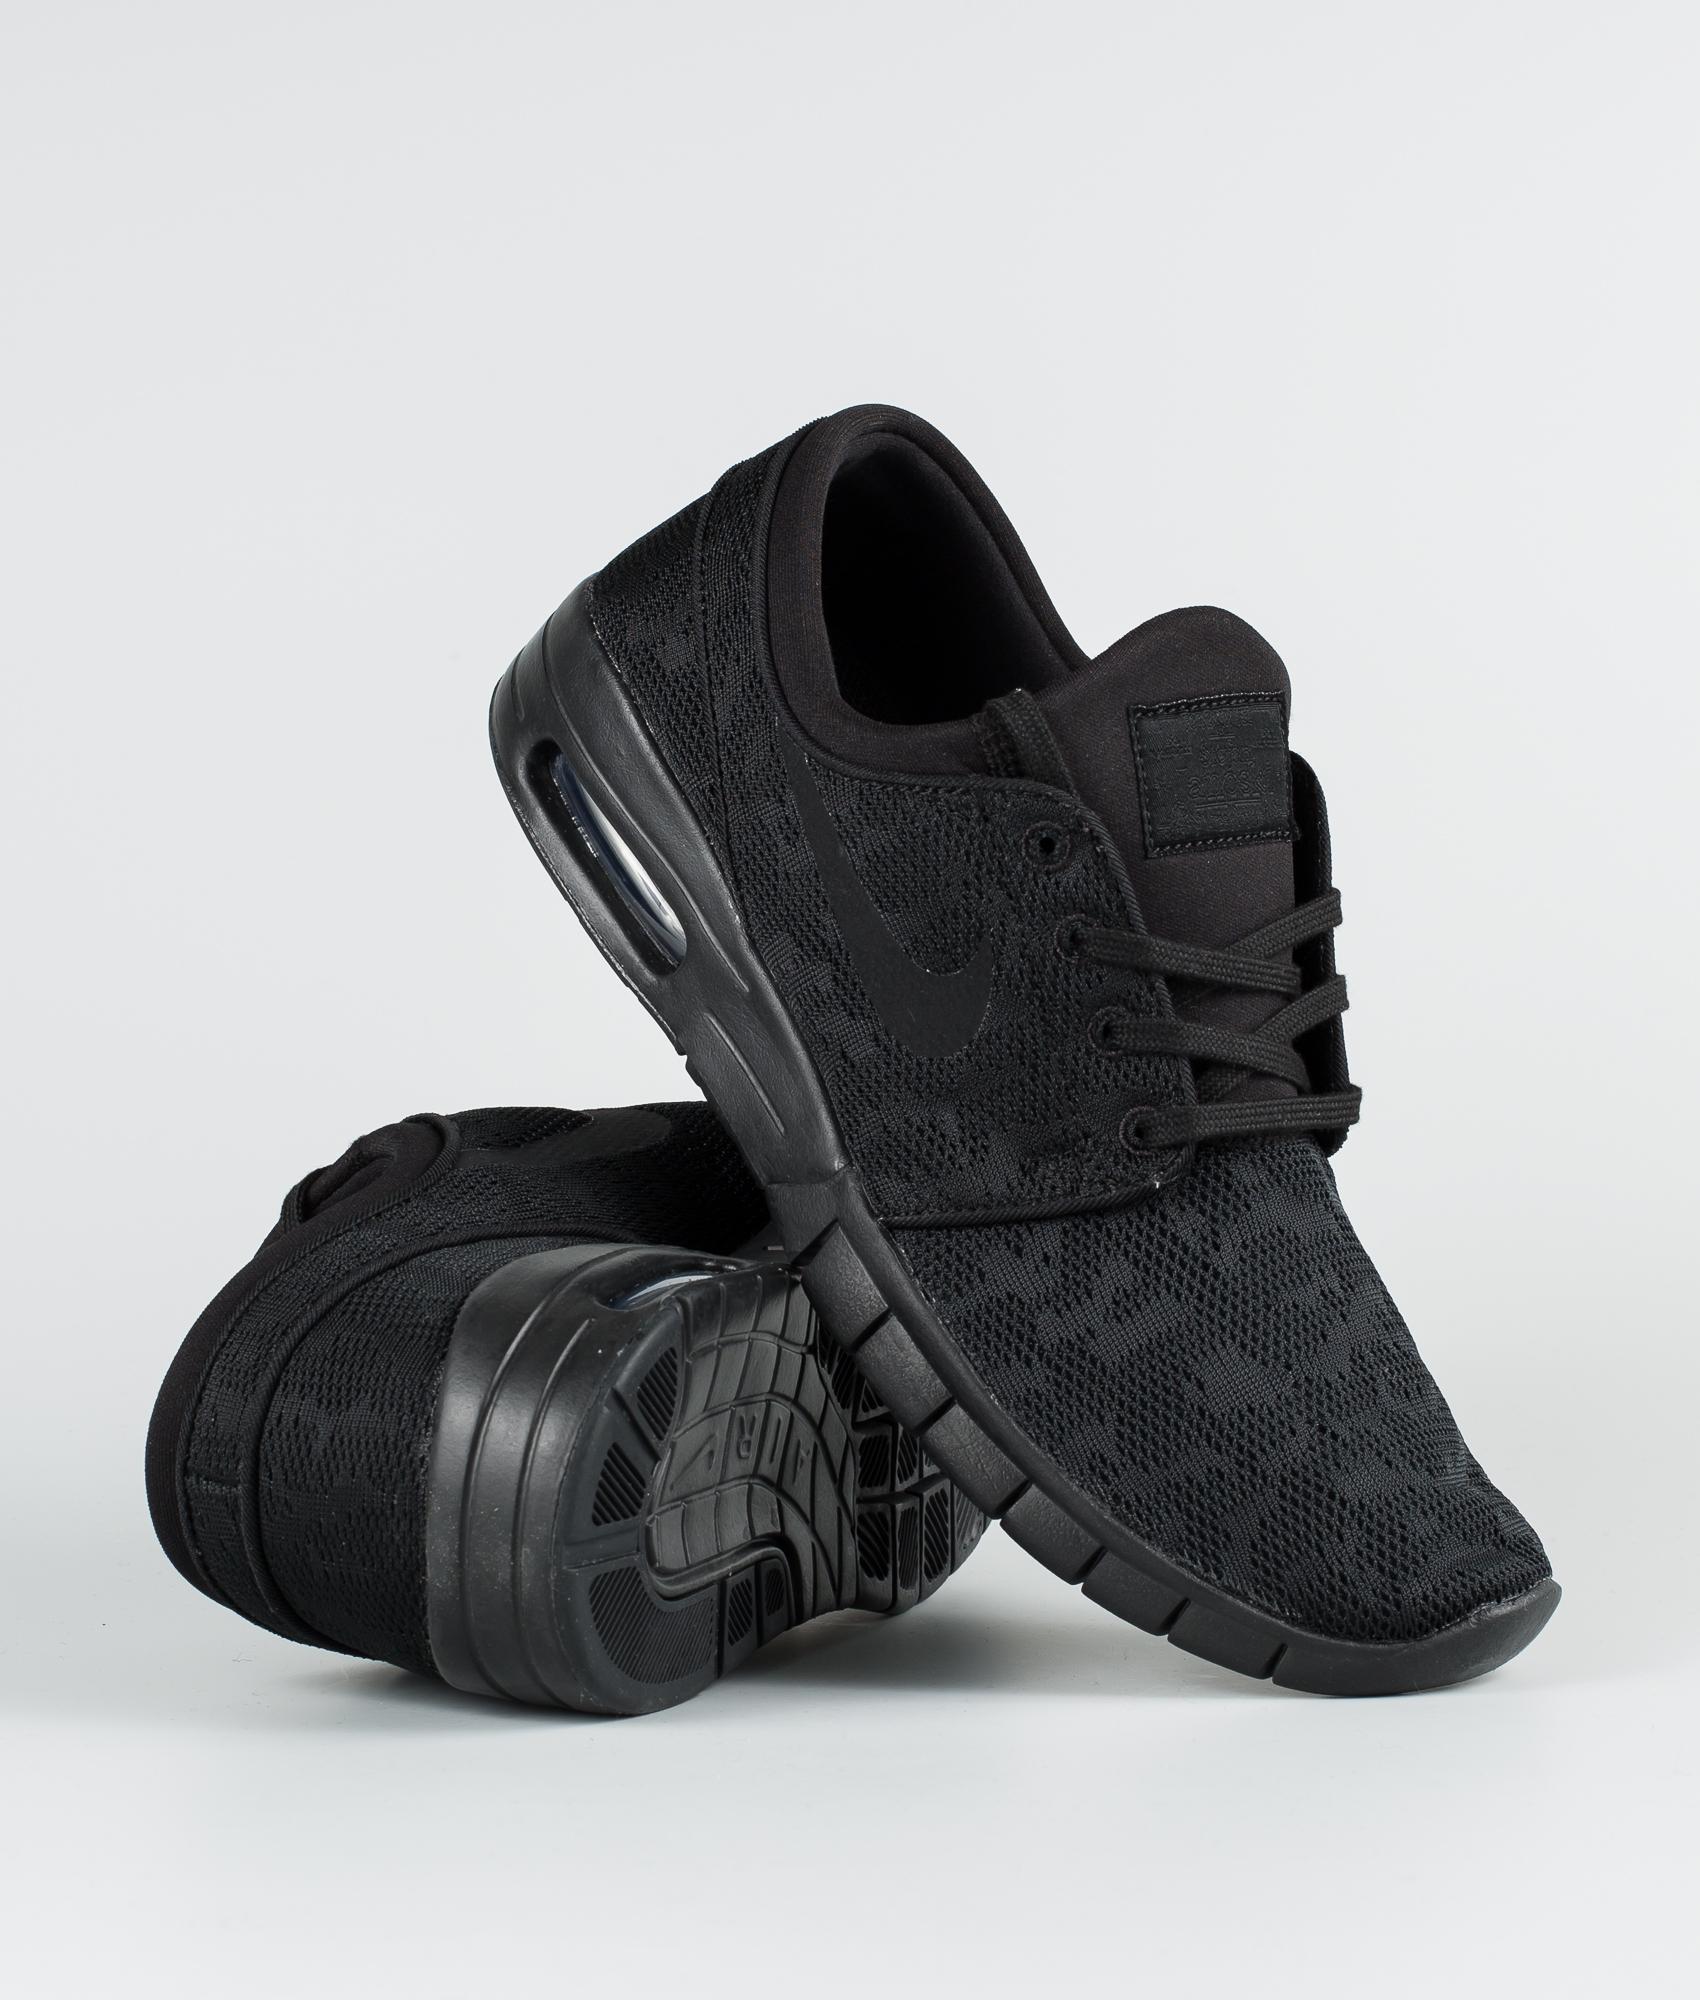 Nike Sb Janoski Max in 2020 | Black nike shoes, Nike sb